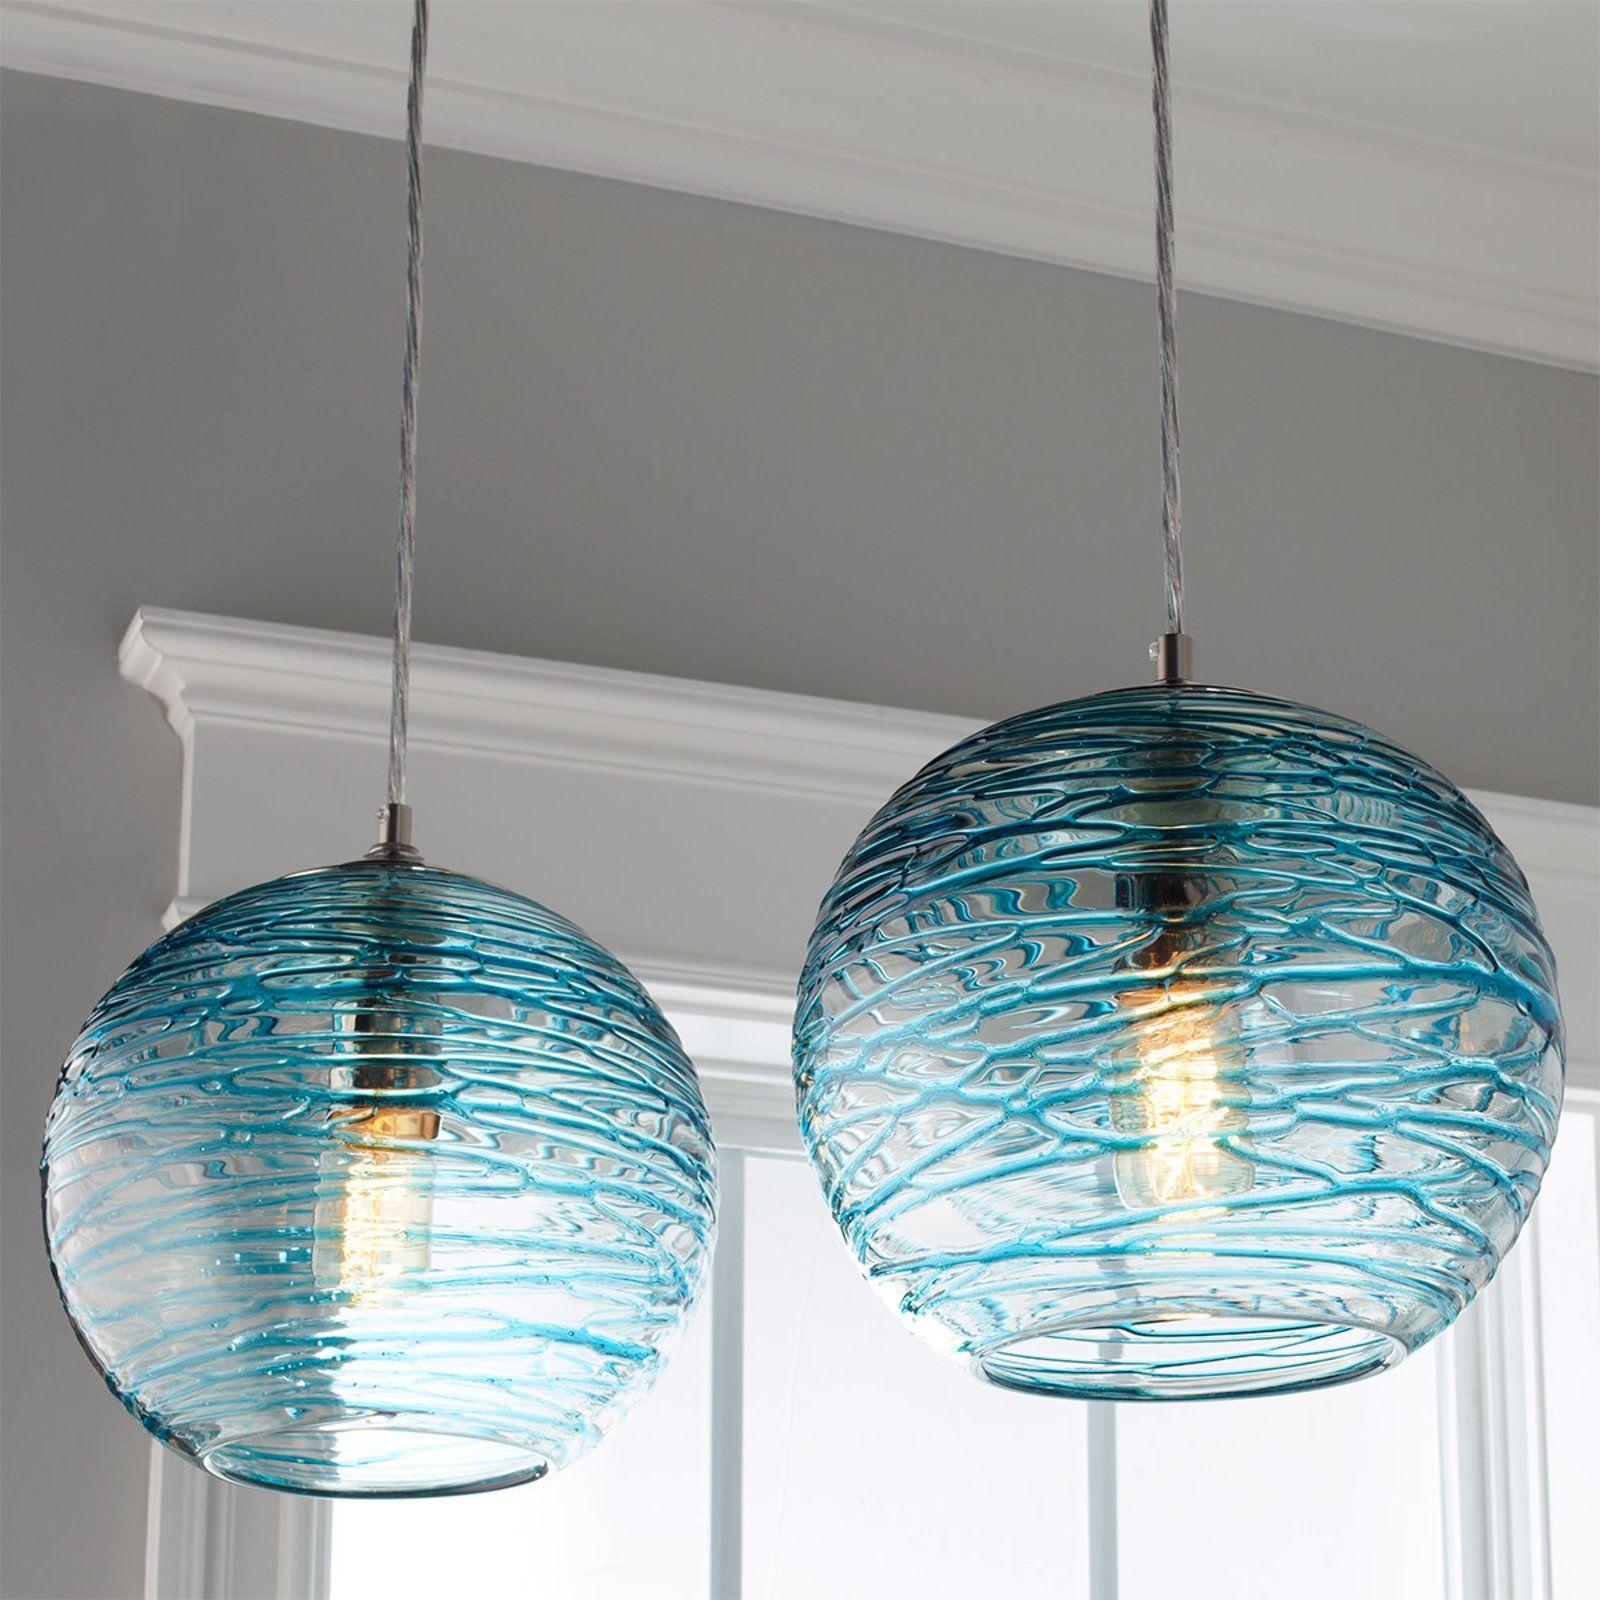 Swirling glass globe pendant light globe pendant light globe swirling glass globe pendant light mozeypictures Choice Image